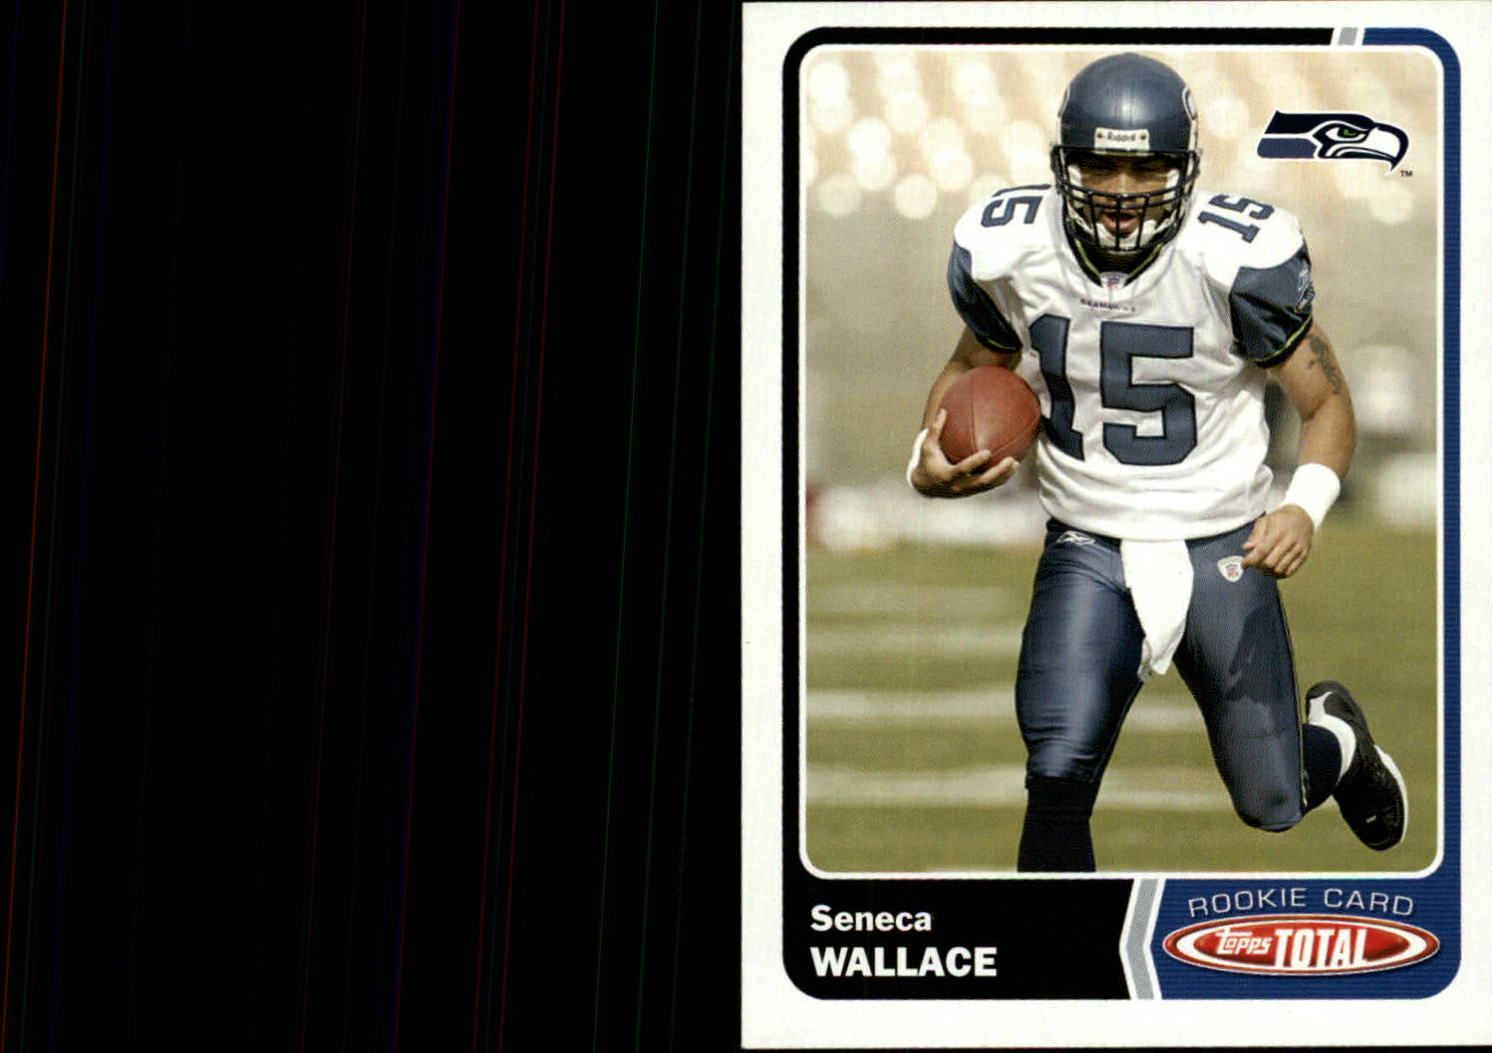 2003 Topps Total #515 Seneca Wallace RC